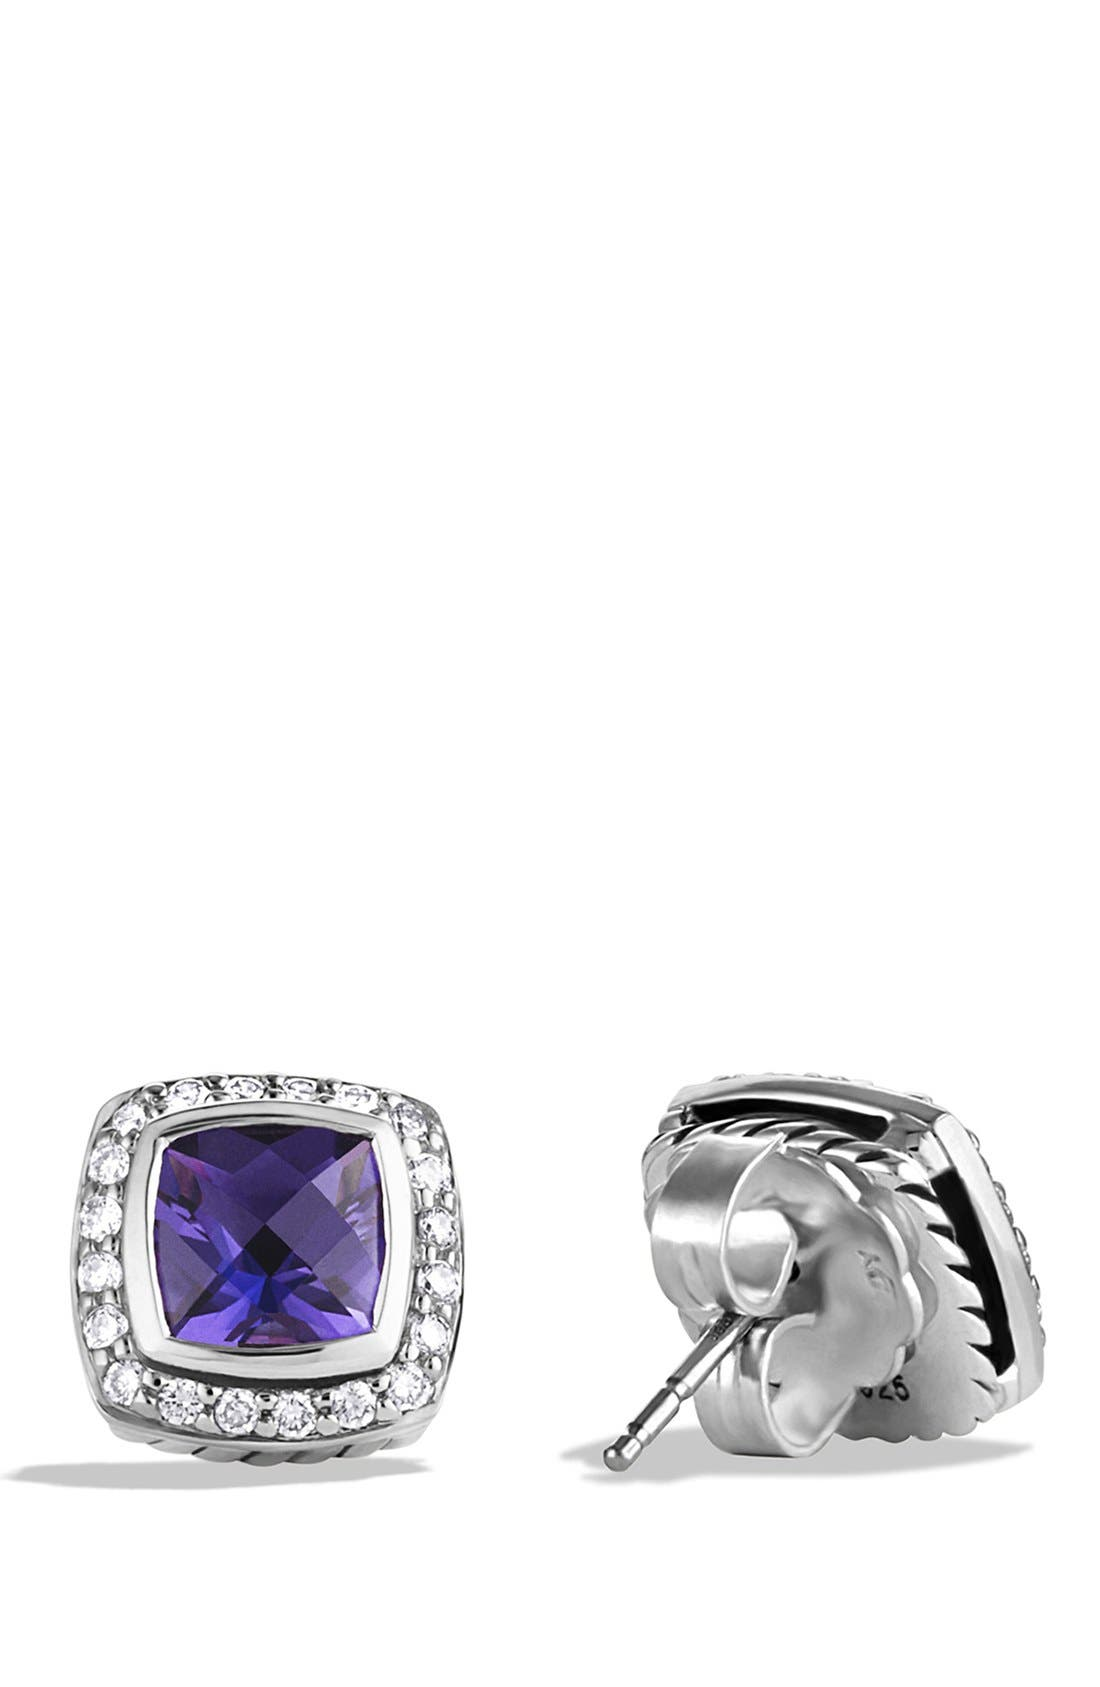 'Albion' Petite Earrings with Semiprecious Stones & Diamonds,                             Alternate thumbnail 8, color,